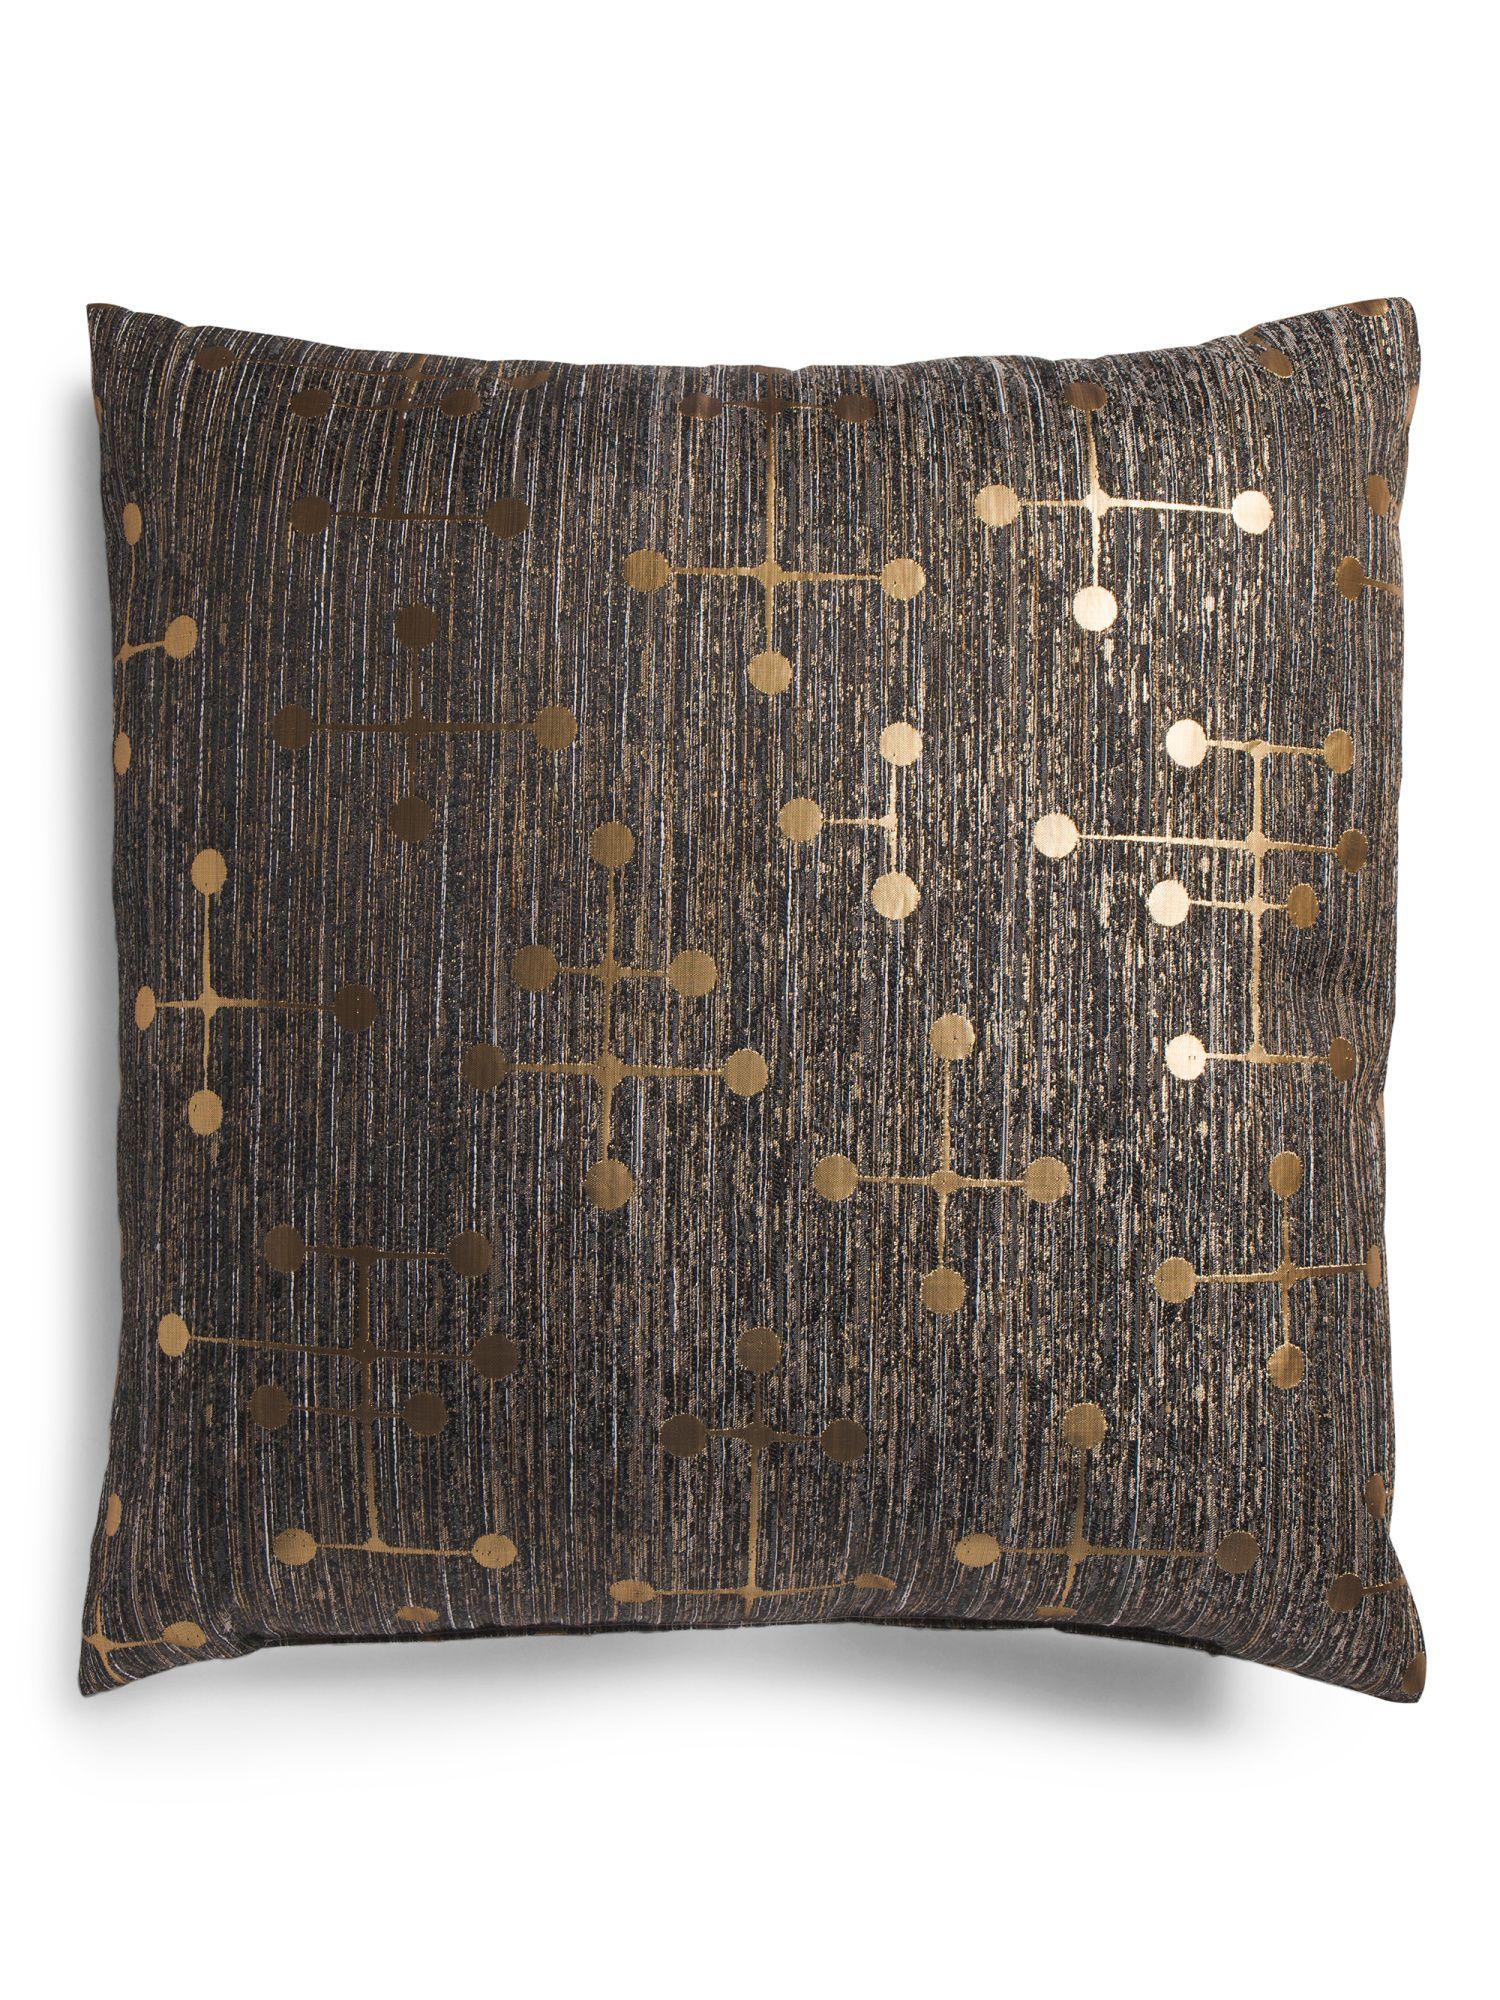 Made In Usa 20x20 Barnstable Pillow Throw Pillows Beige Throw Pillows Pillows